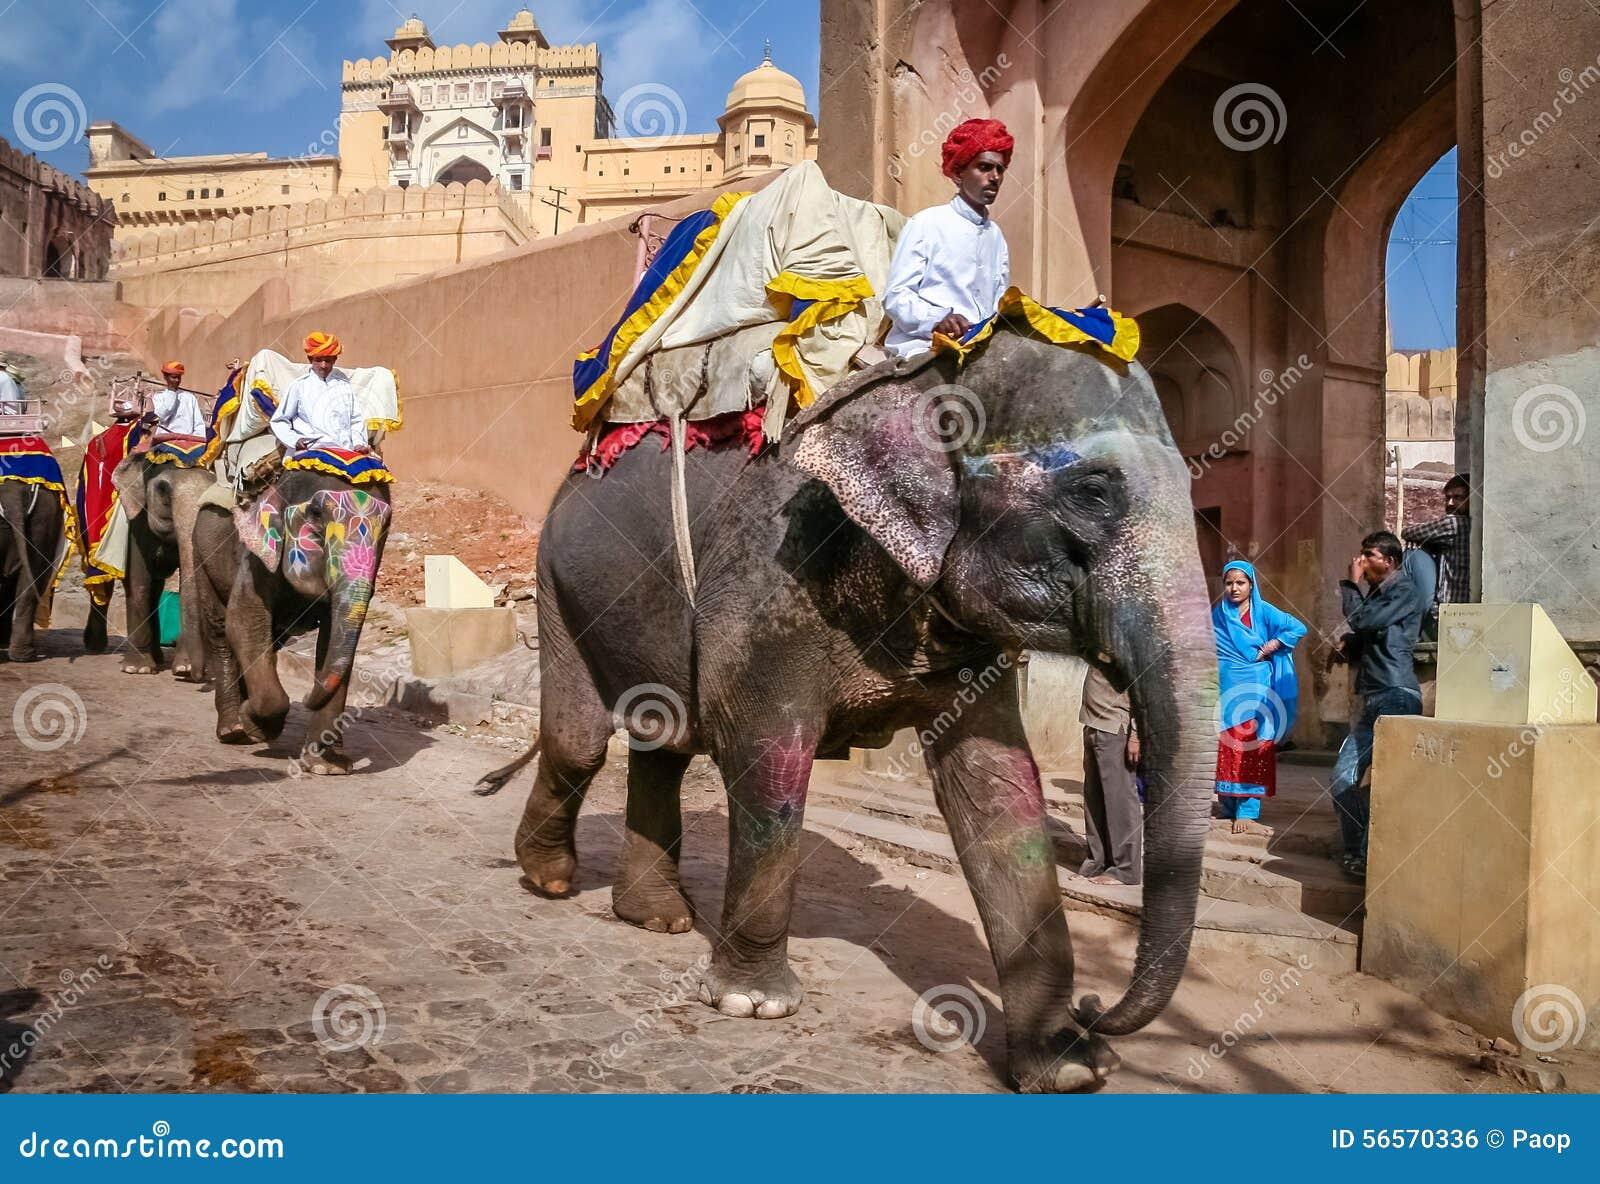 Download Μεταφορά ελεφάντων εκδοτική εικόνες. εικόνα από παλαιός - 56570336